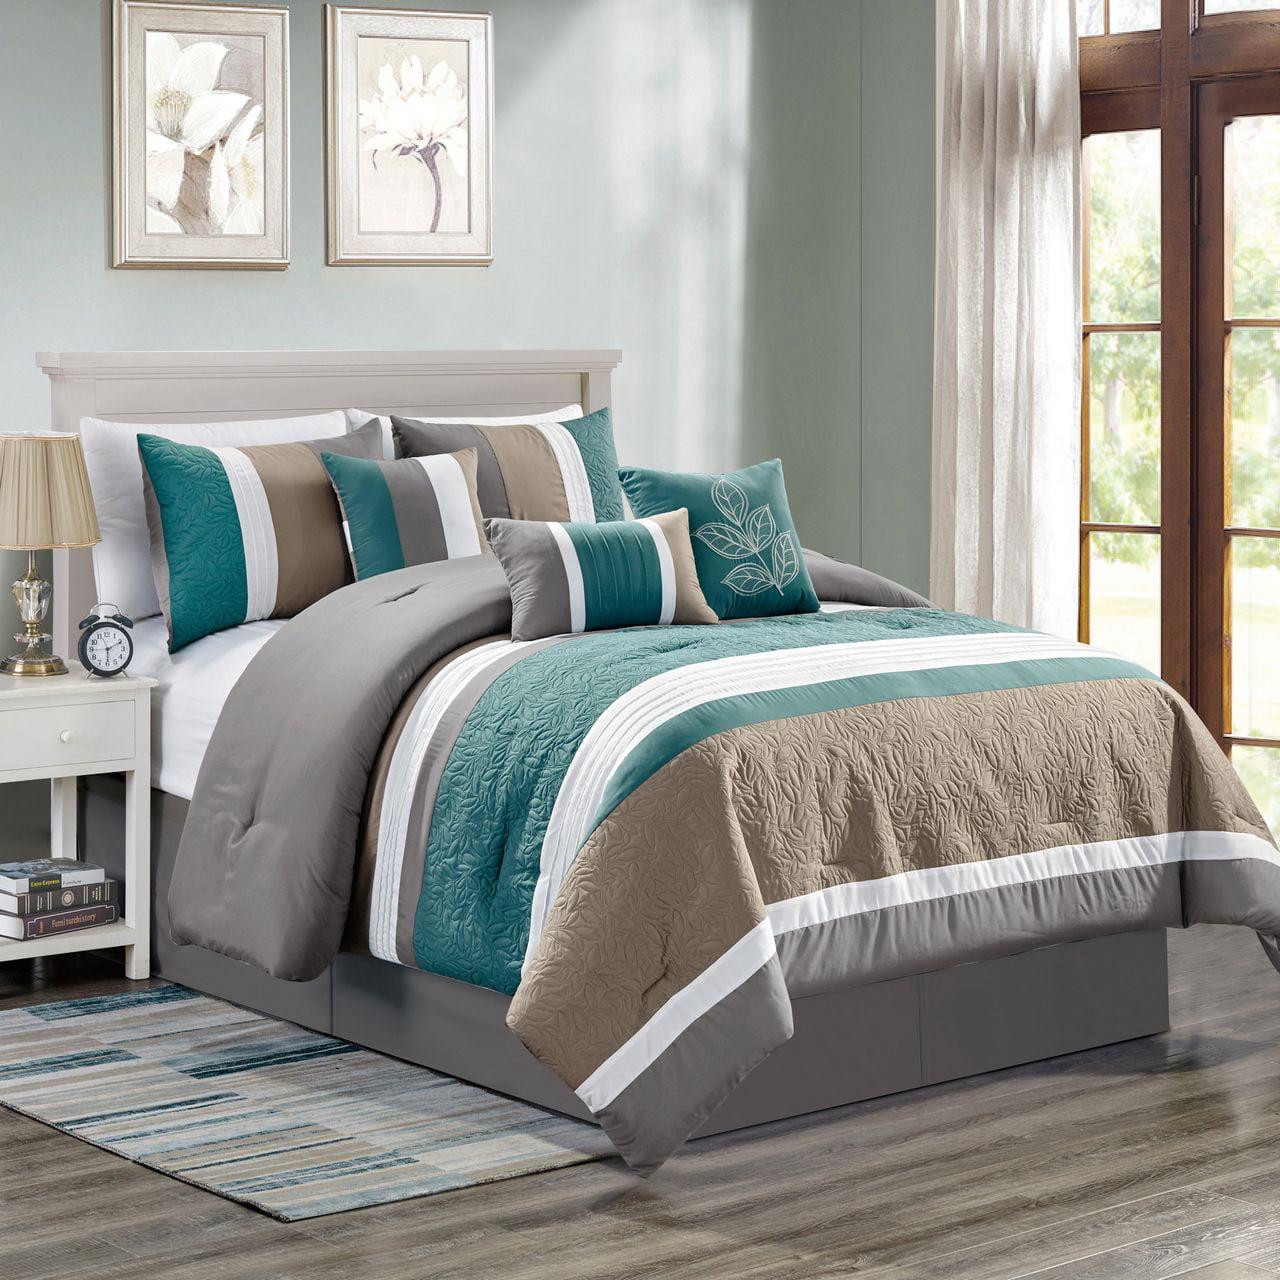 7 Piece Abel Teal Gray Taupe Comforter Set King Walmart Com Walmart Com